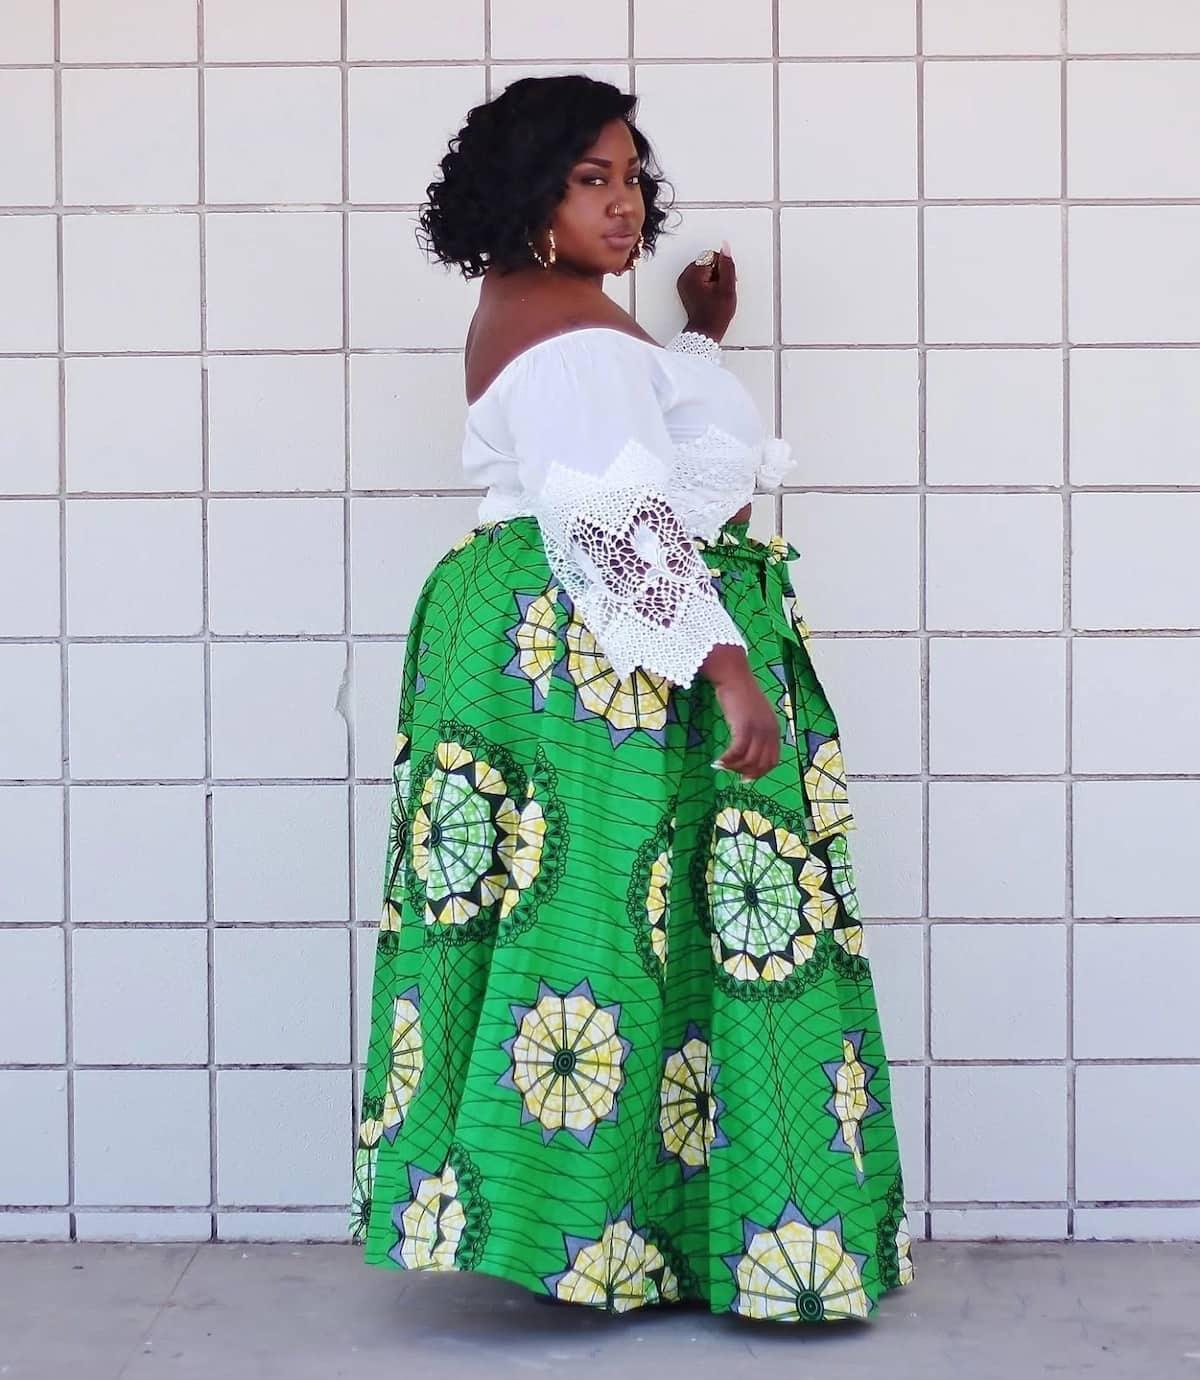 61003fdaebe 2018 Trends Of African Print Dresses For Plus Size Ladies ▷ Tuko.co.ke